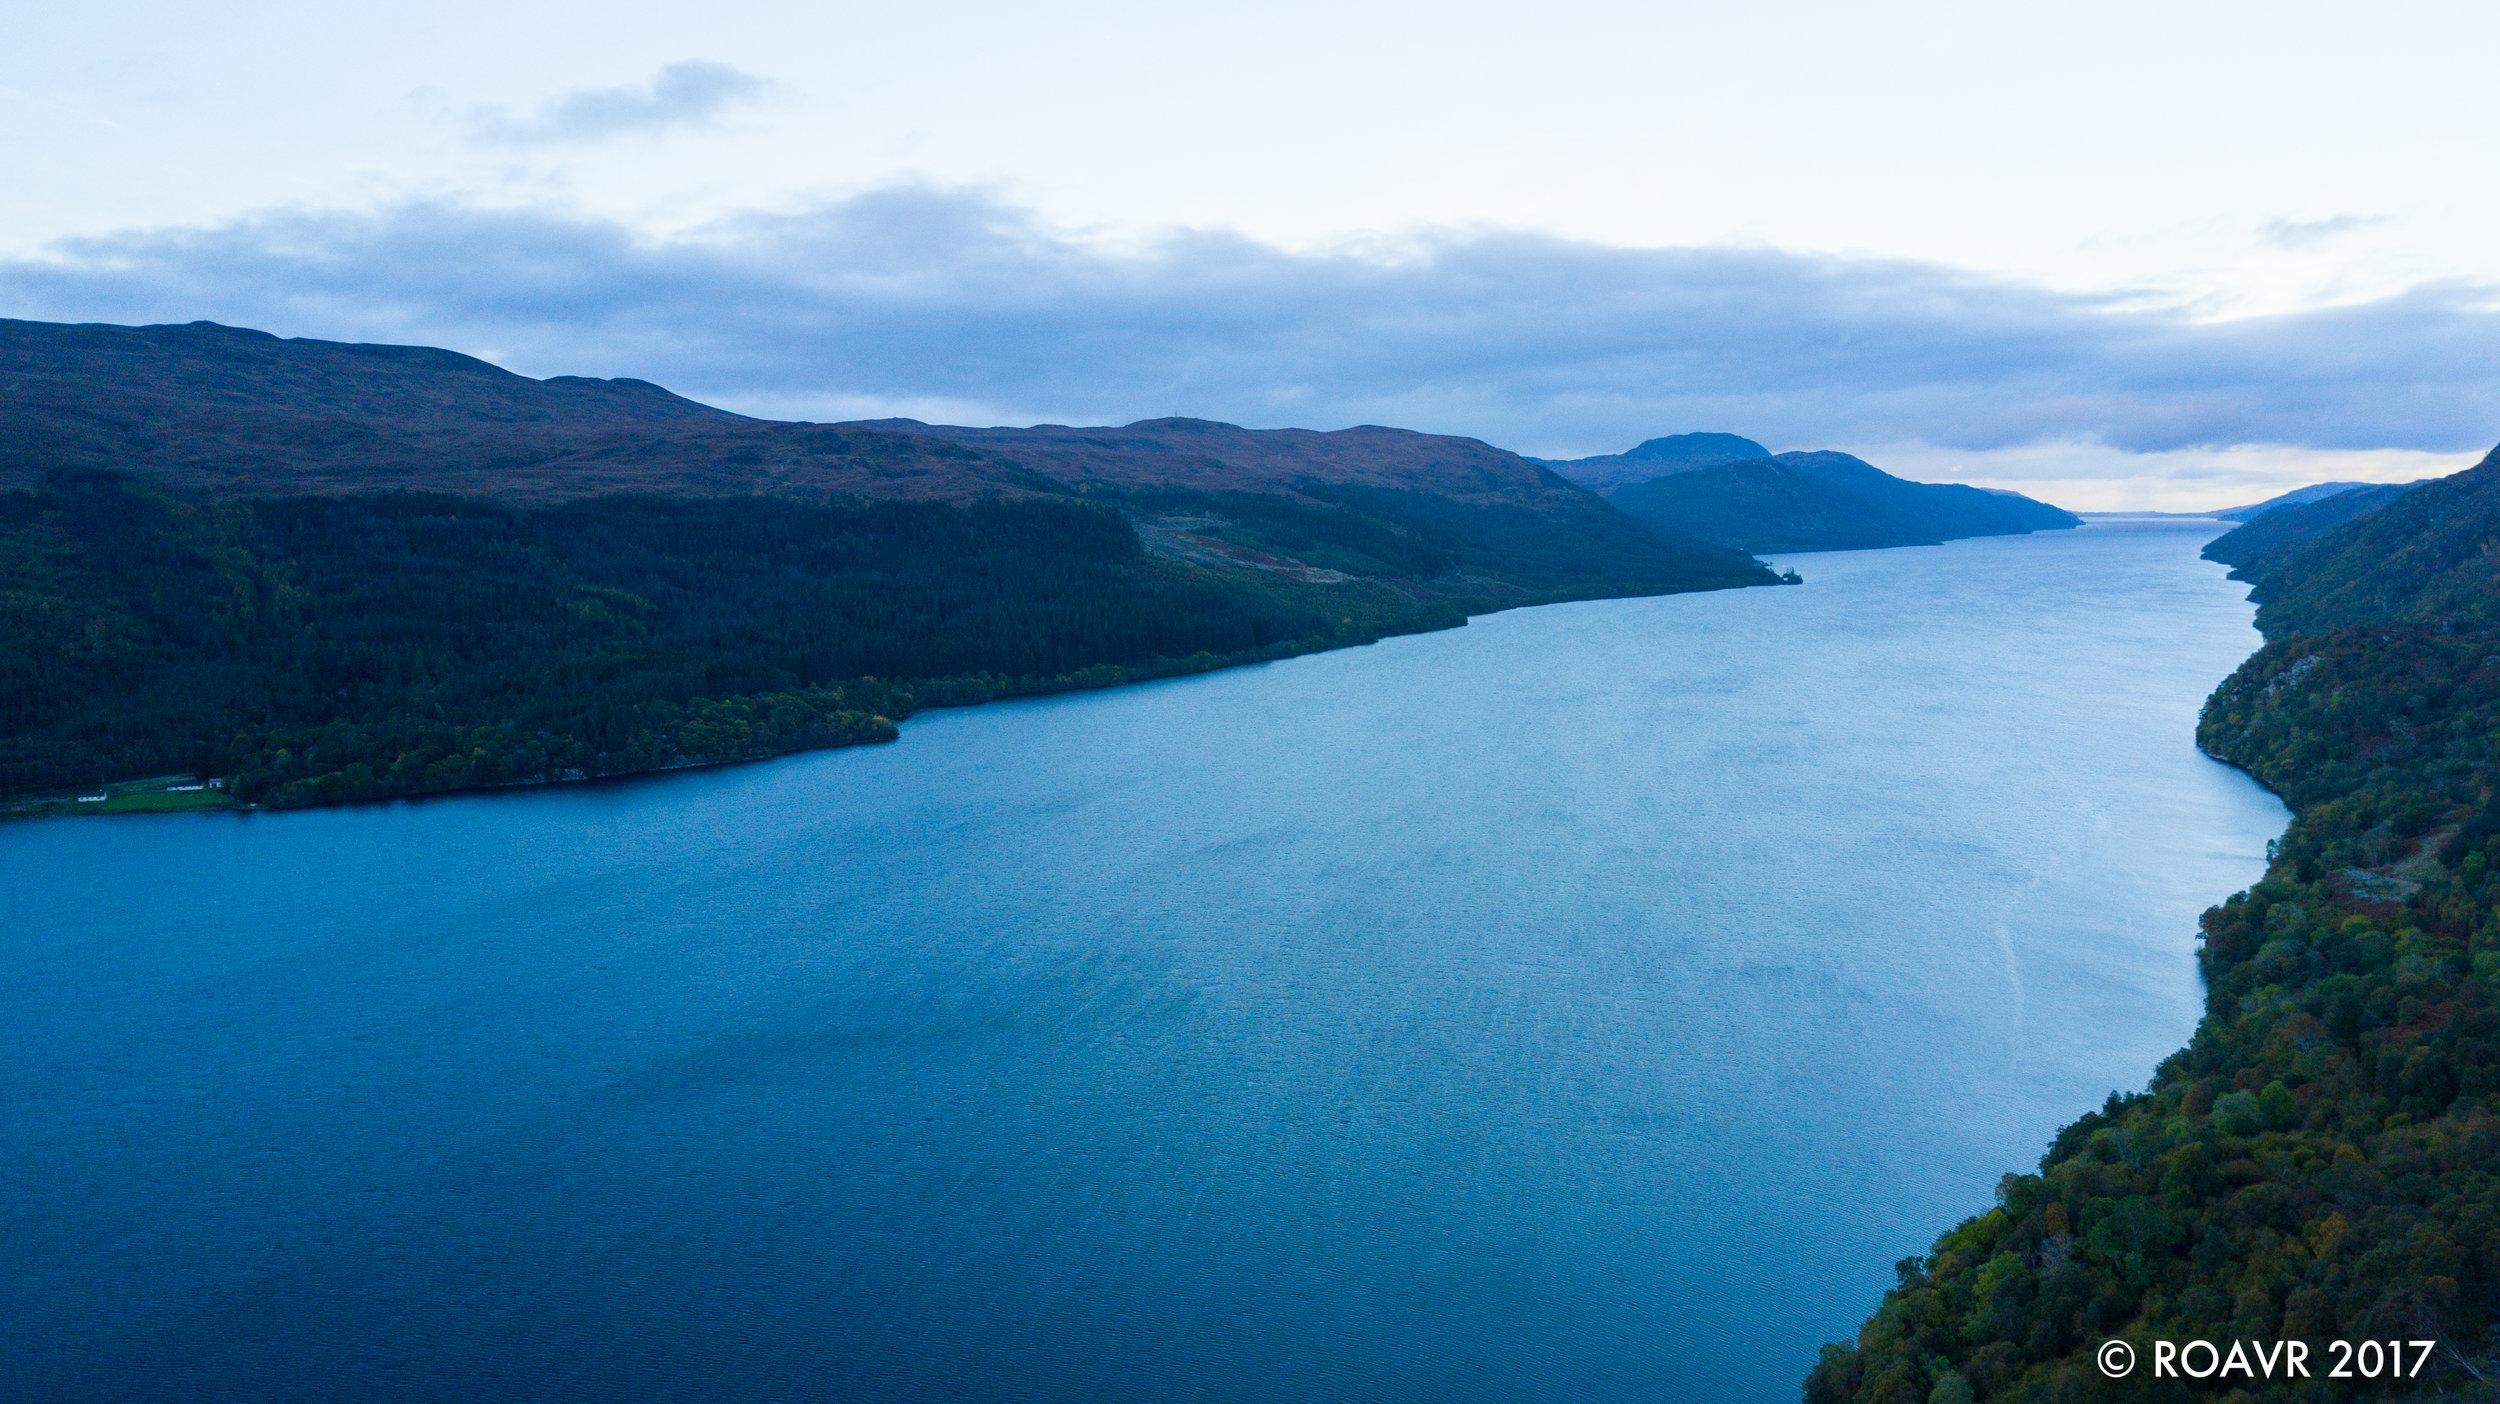 Loch Ness - Looking northeast.